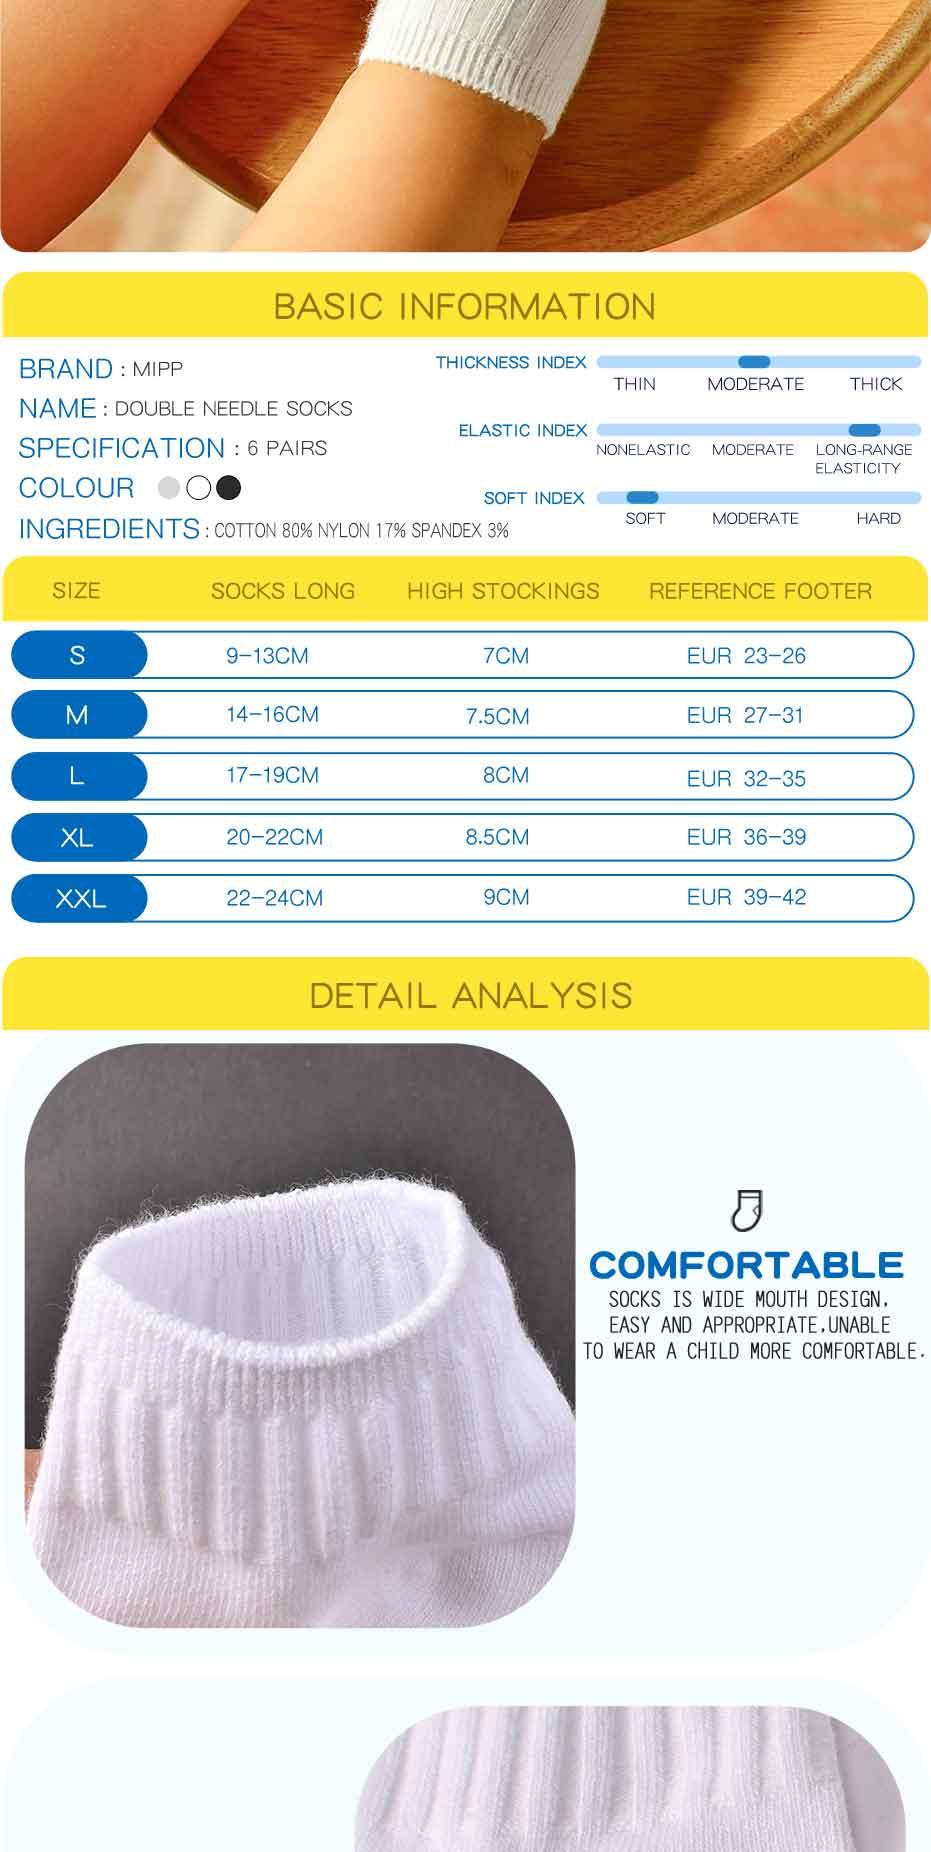 Double-needle-socks-description_02